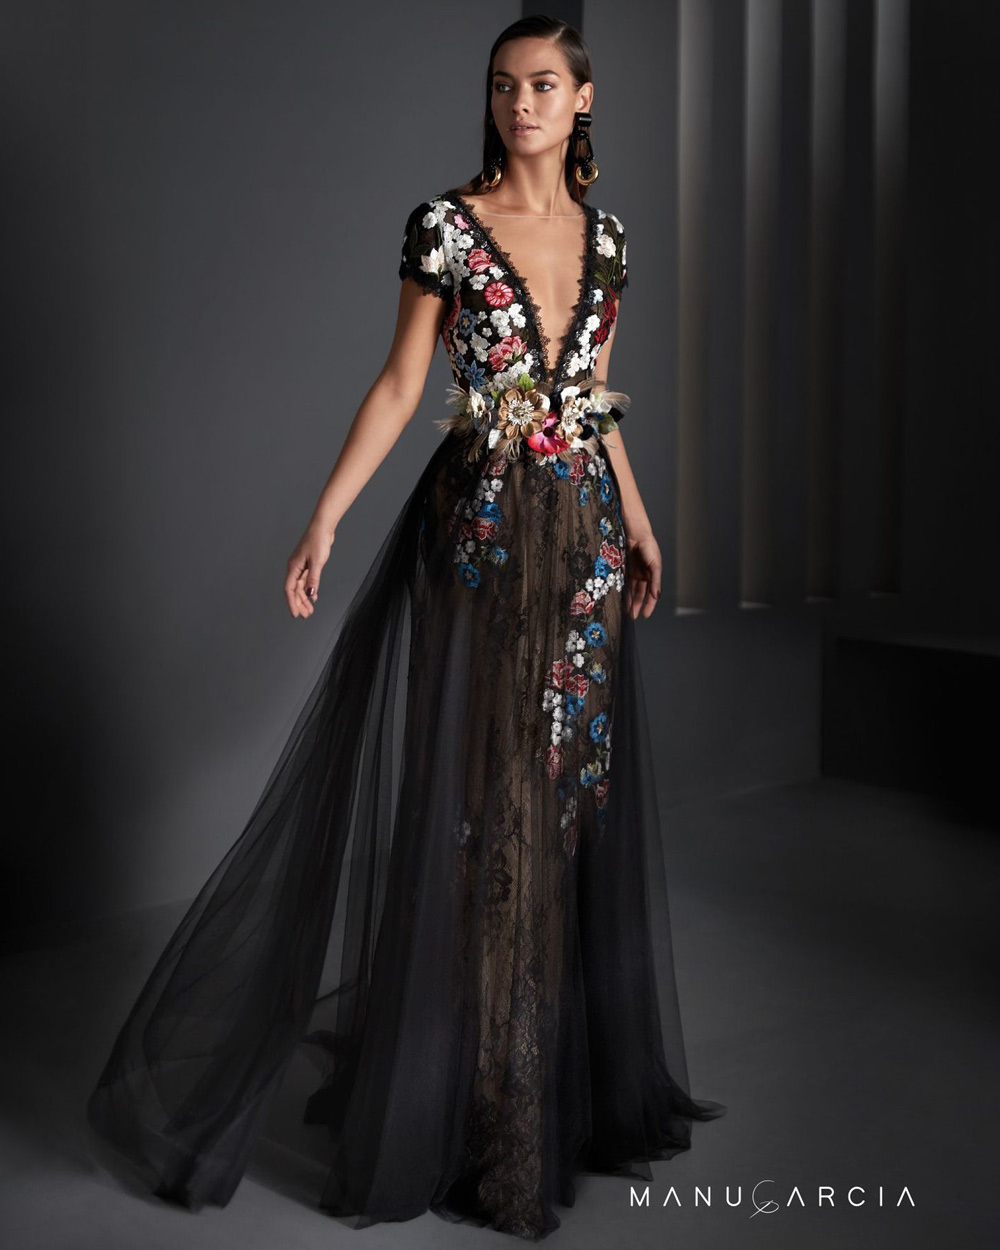 vestido de fiesta manu garcia MG3112